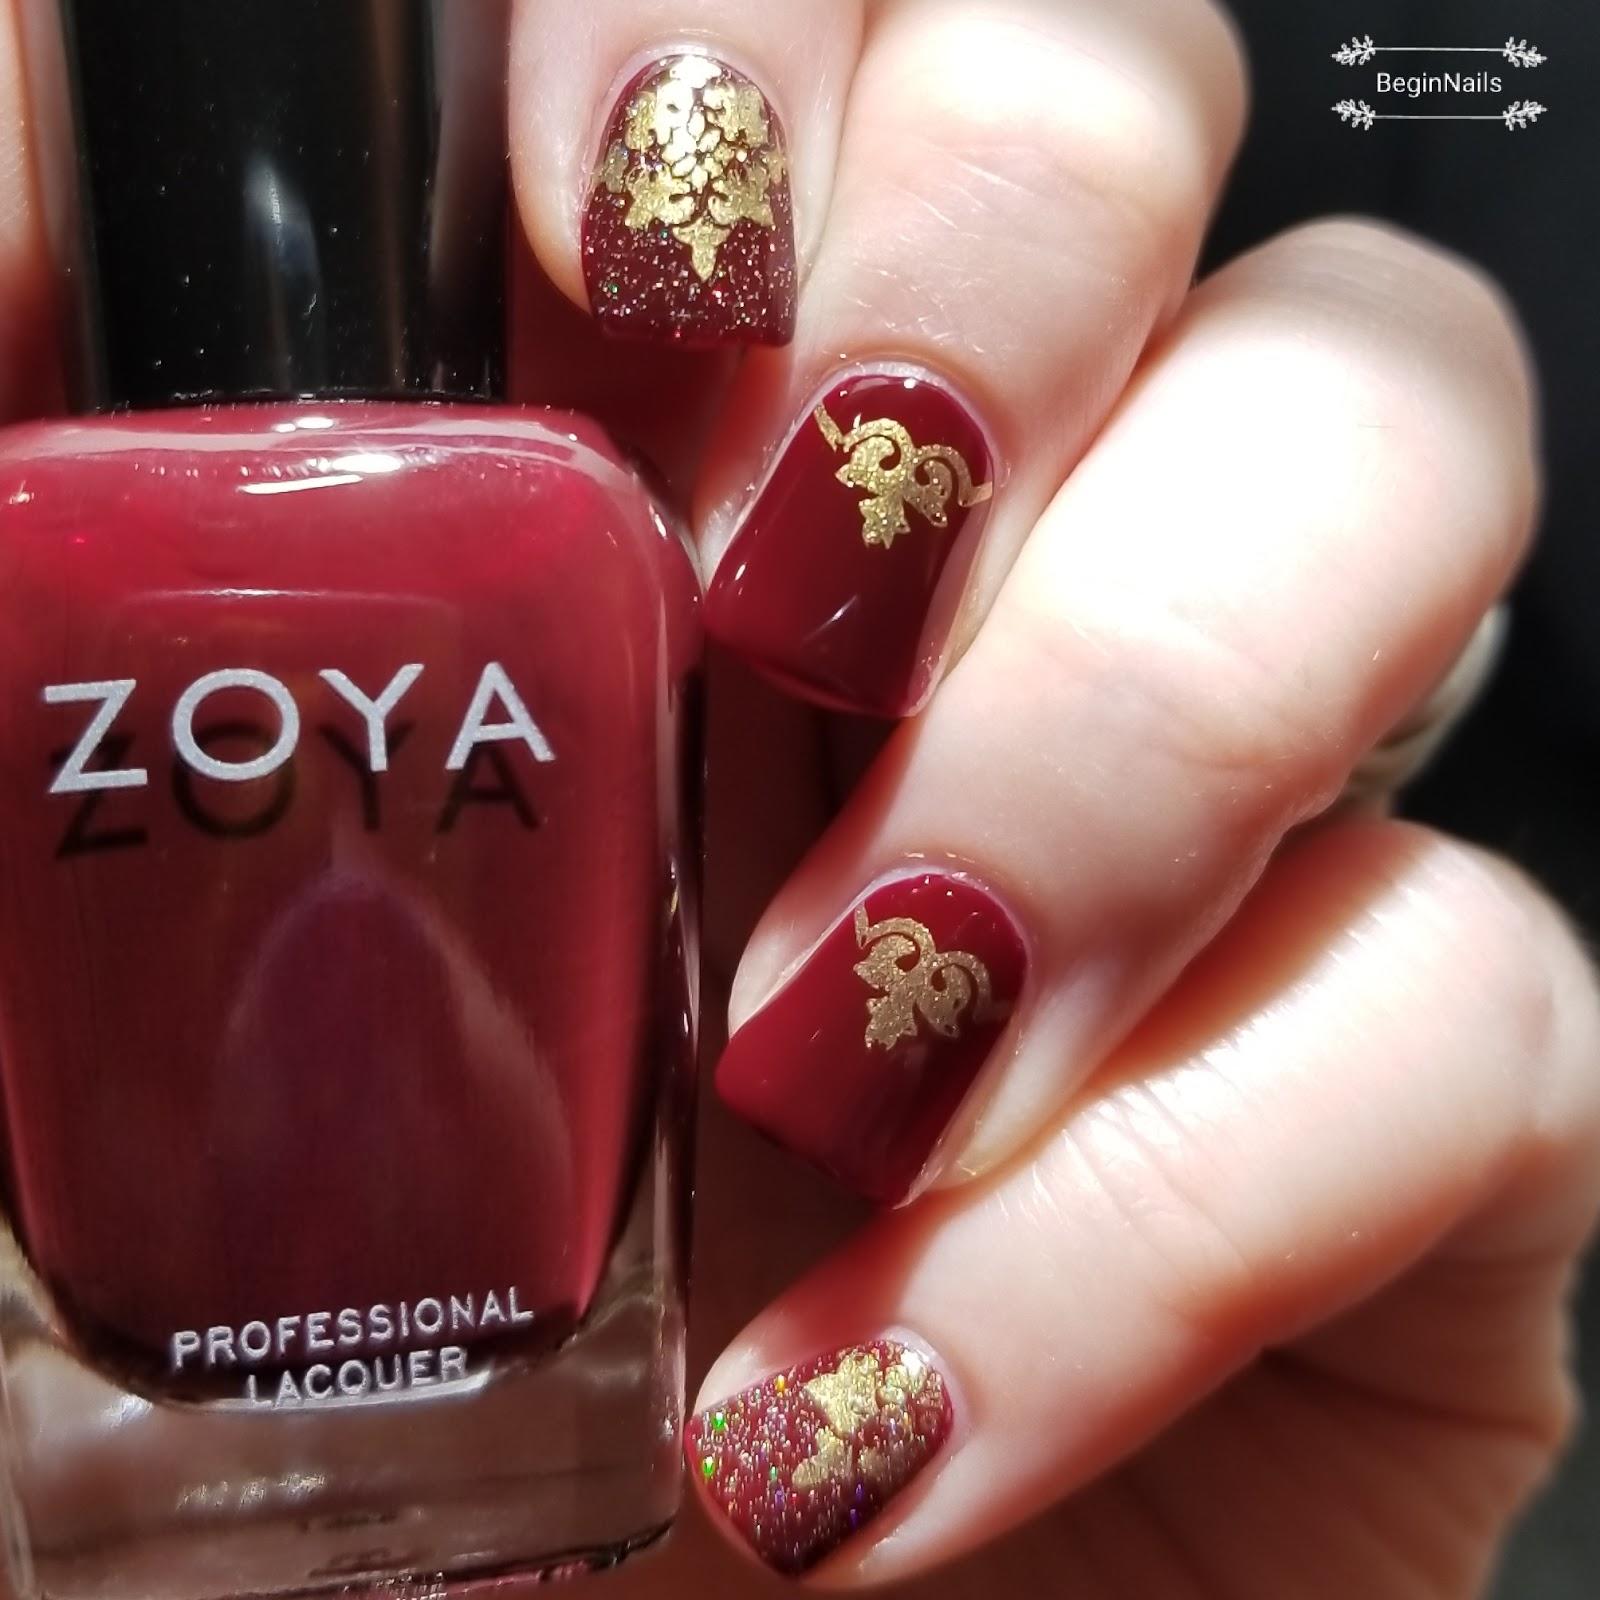 Let\'s Begin Nails: Natural Healthy Concepts - Zoya Sam Review